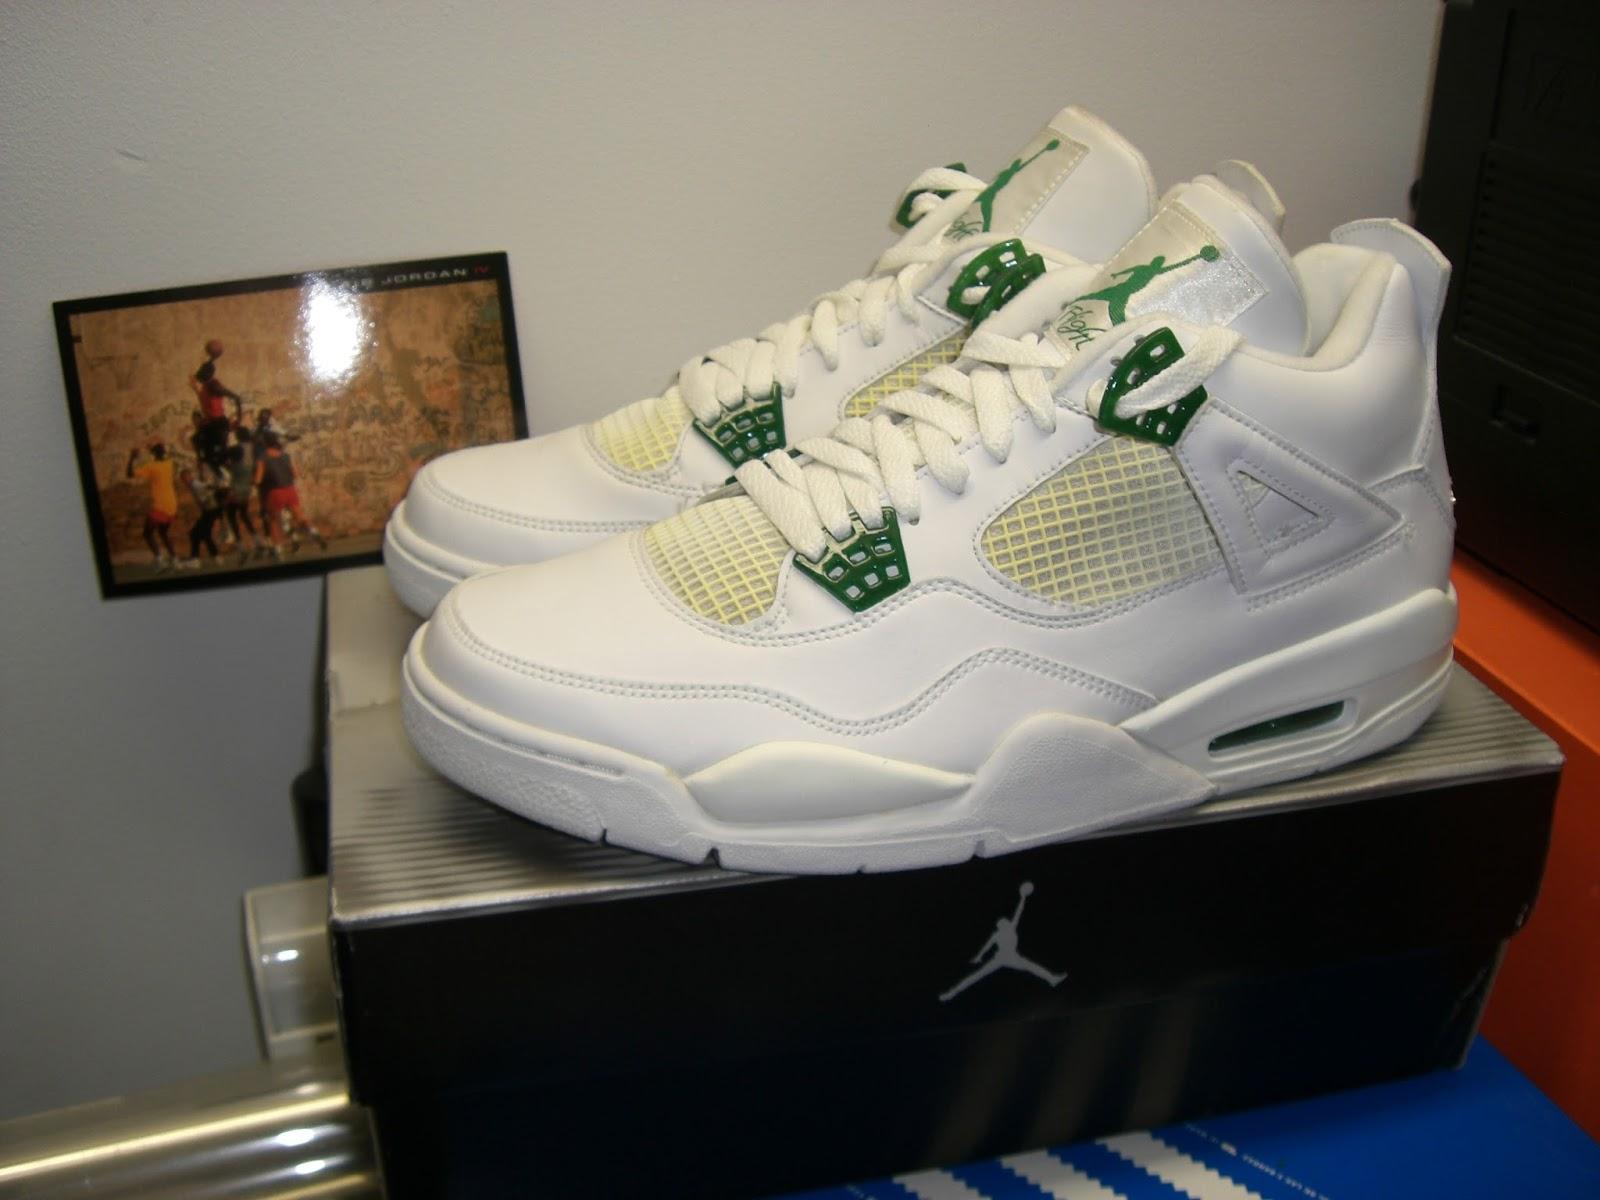 160a72314ea 4 the Love of Sneakers: 2004 Nike Air Jordan IV Retro in White, Chrome, Classic  Green